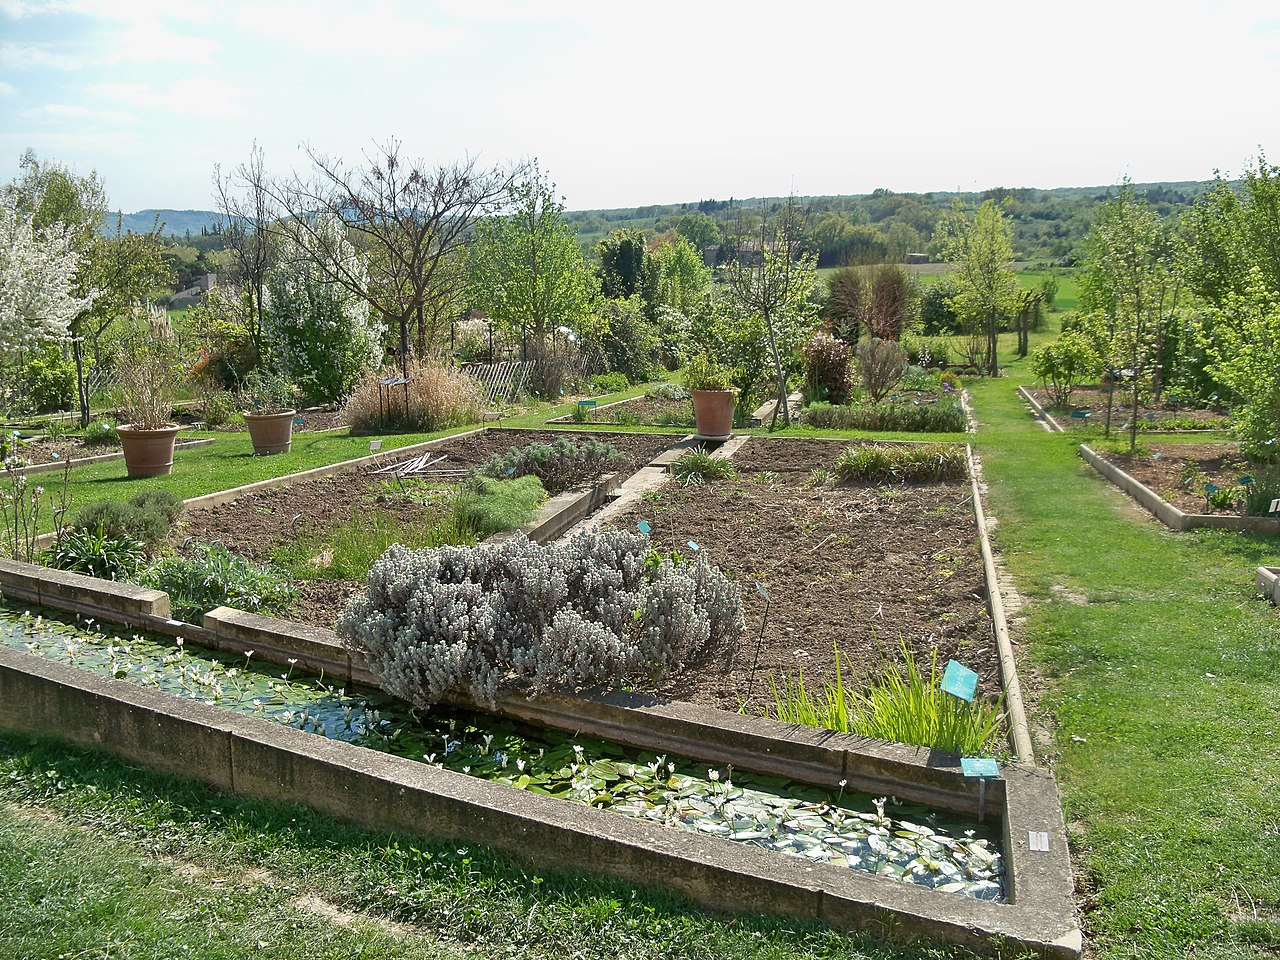 File:Mane - Prieuré de Salagon, jardin moderne 2.jpg ...